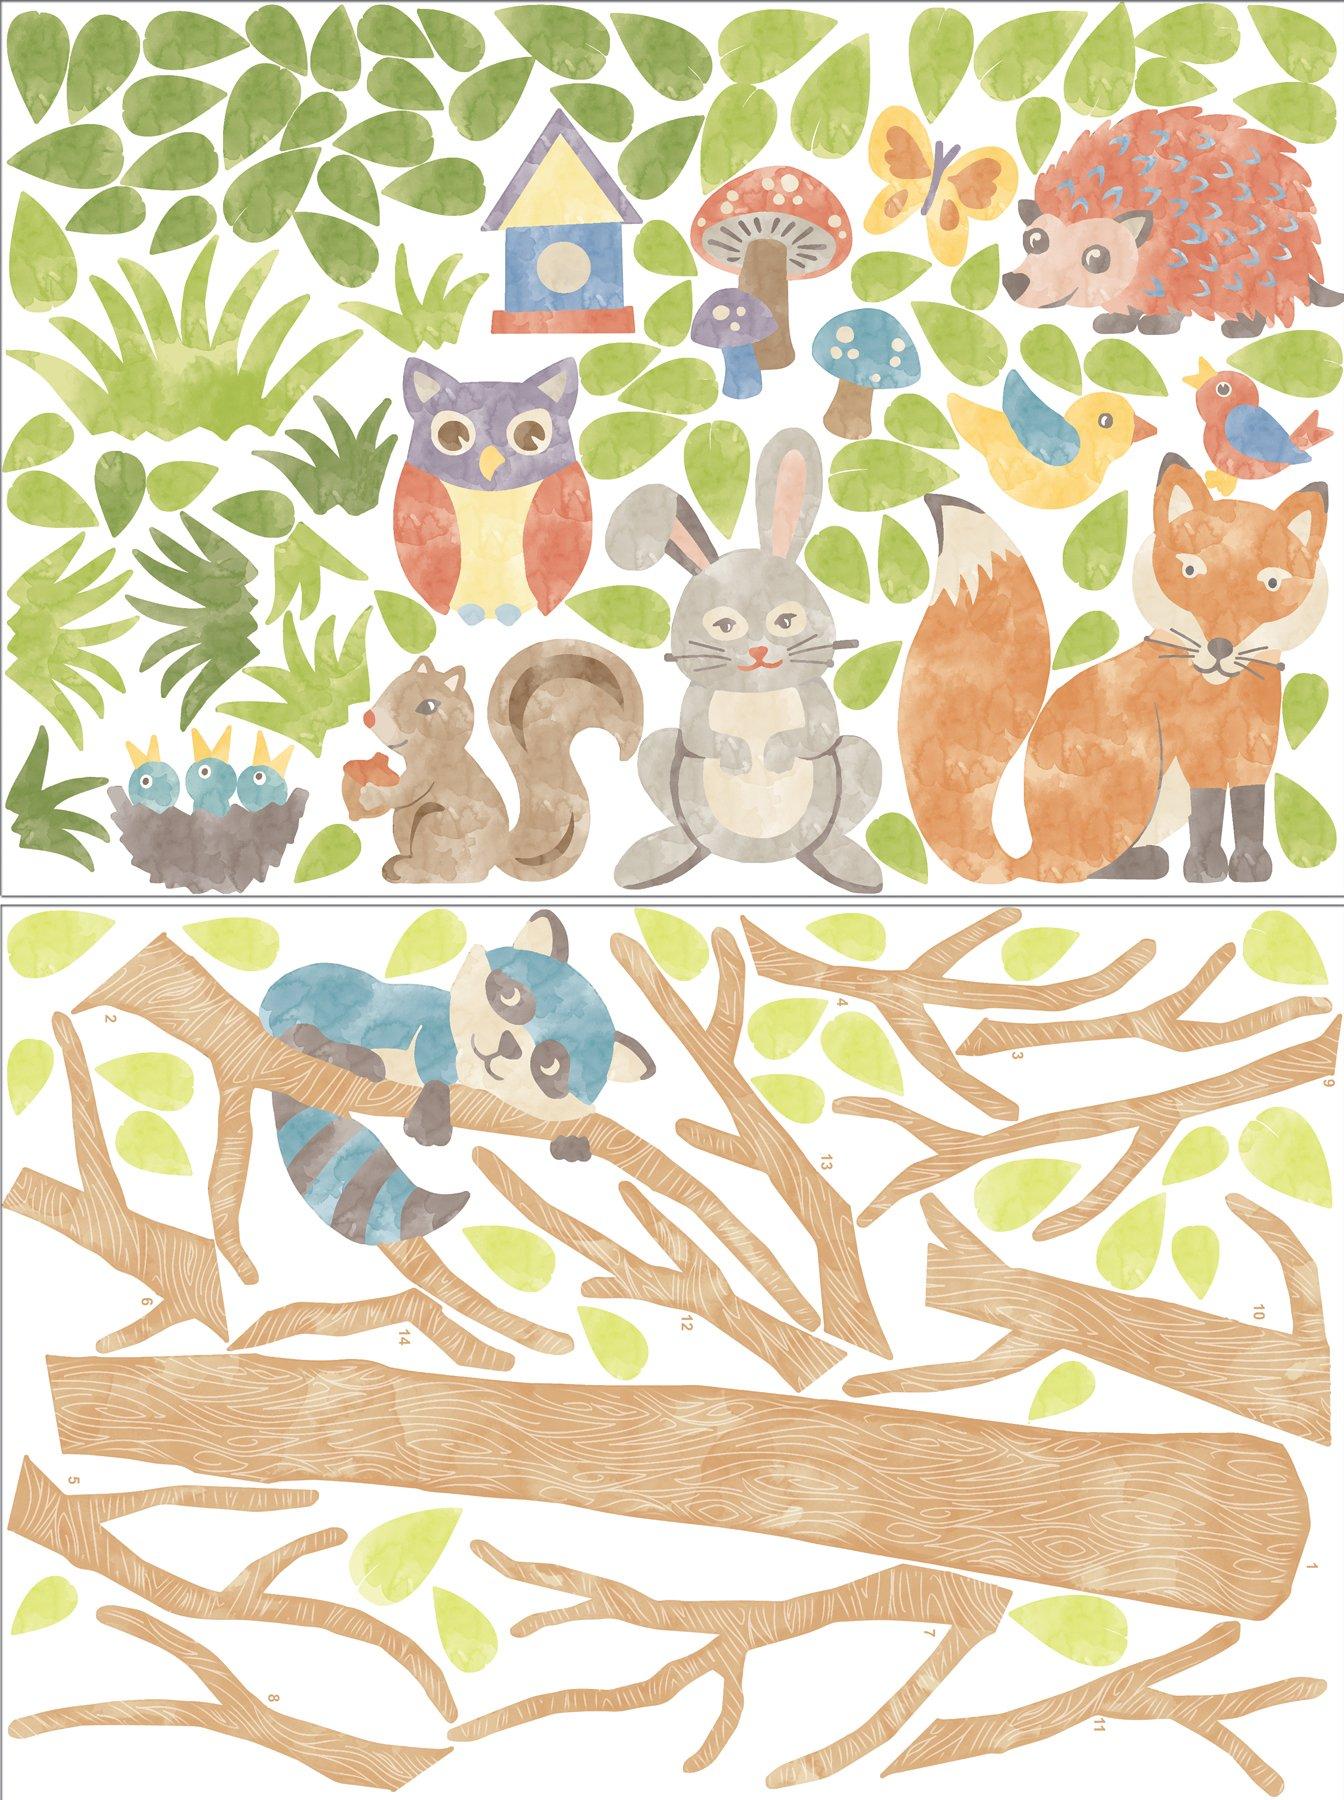 Wall Pops WPK1164 Woodland Tree Kit - - Amazon.com